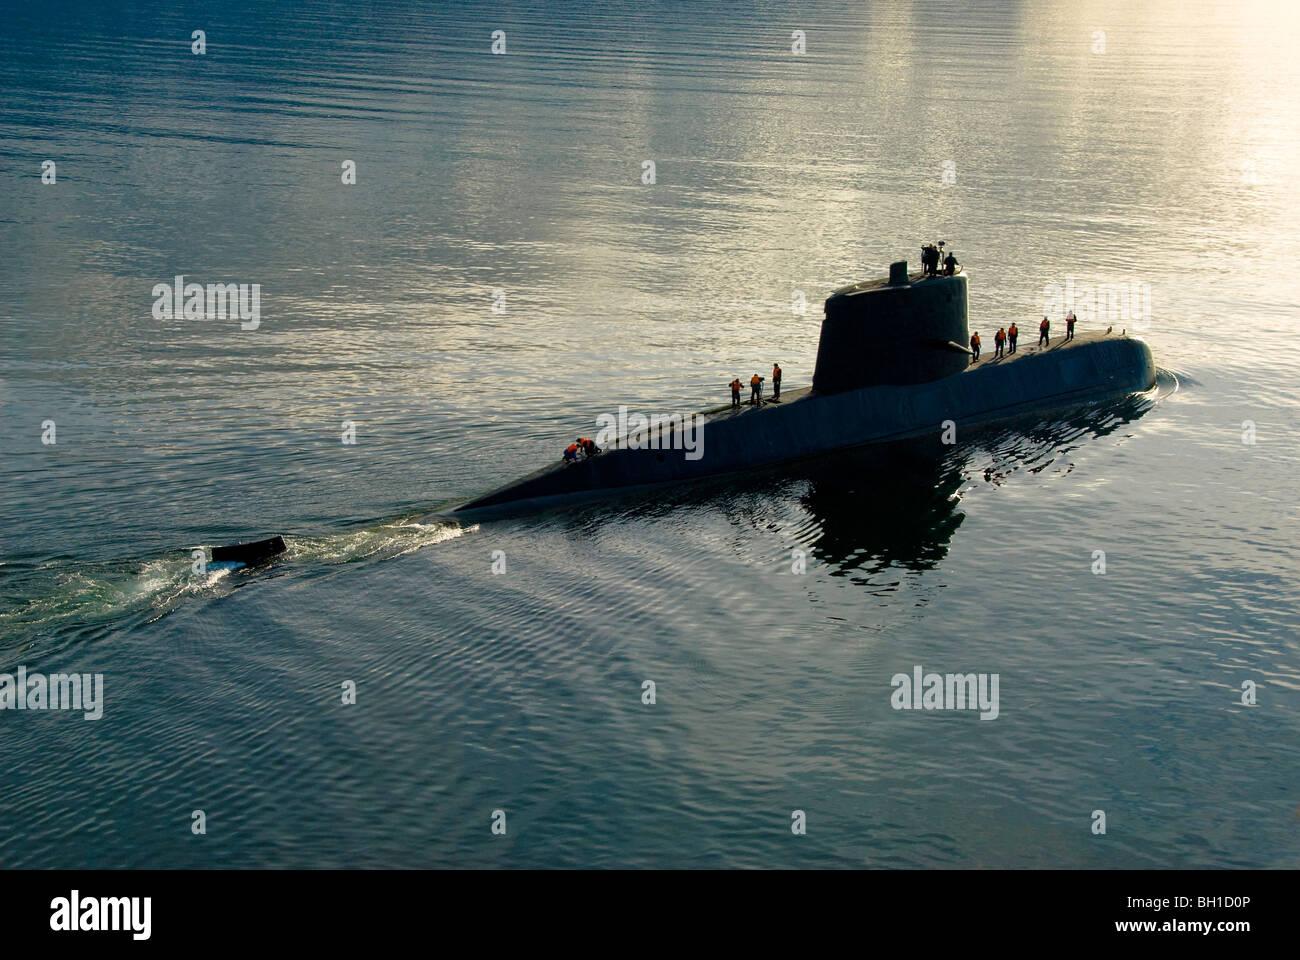 Santa Cruz class Submarine TR-1700 and crew of the Argentine Navy in ocean - Stock Image